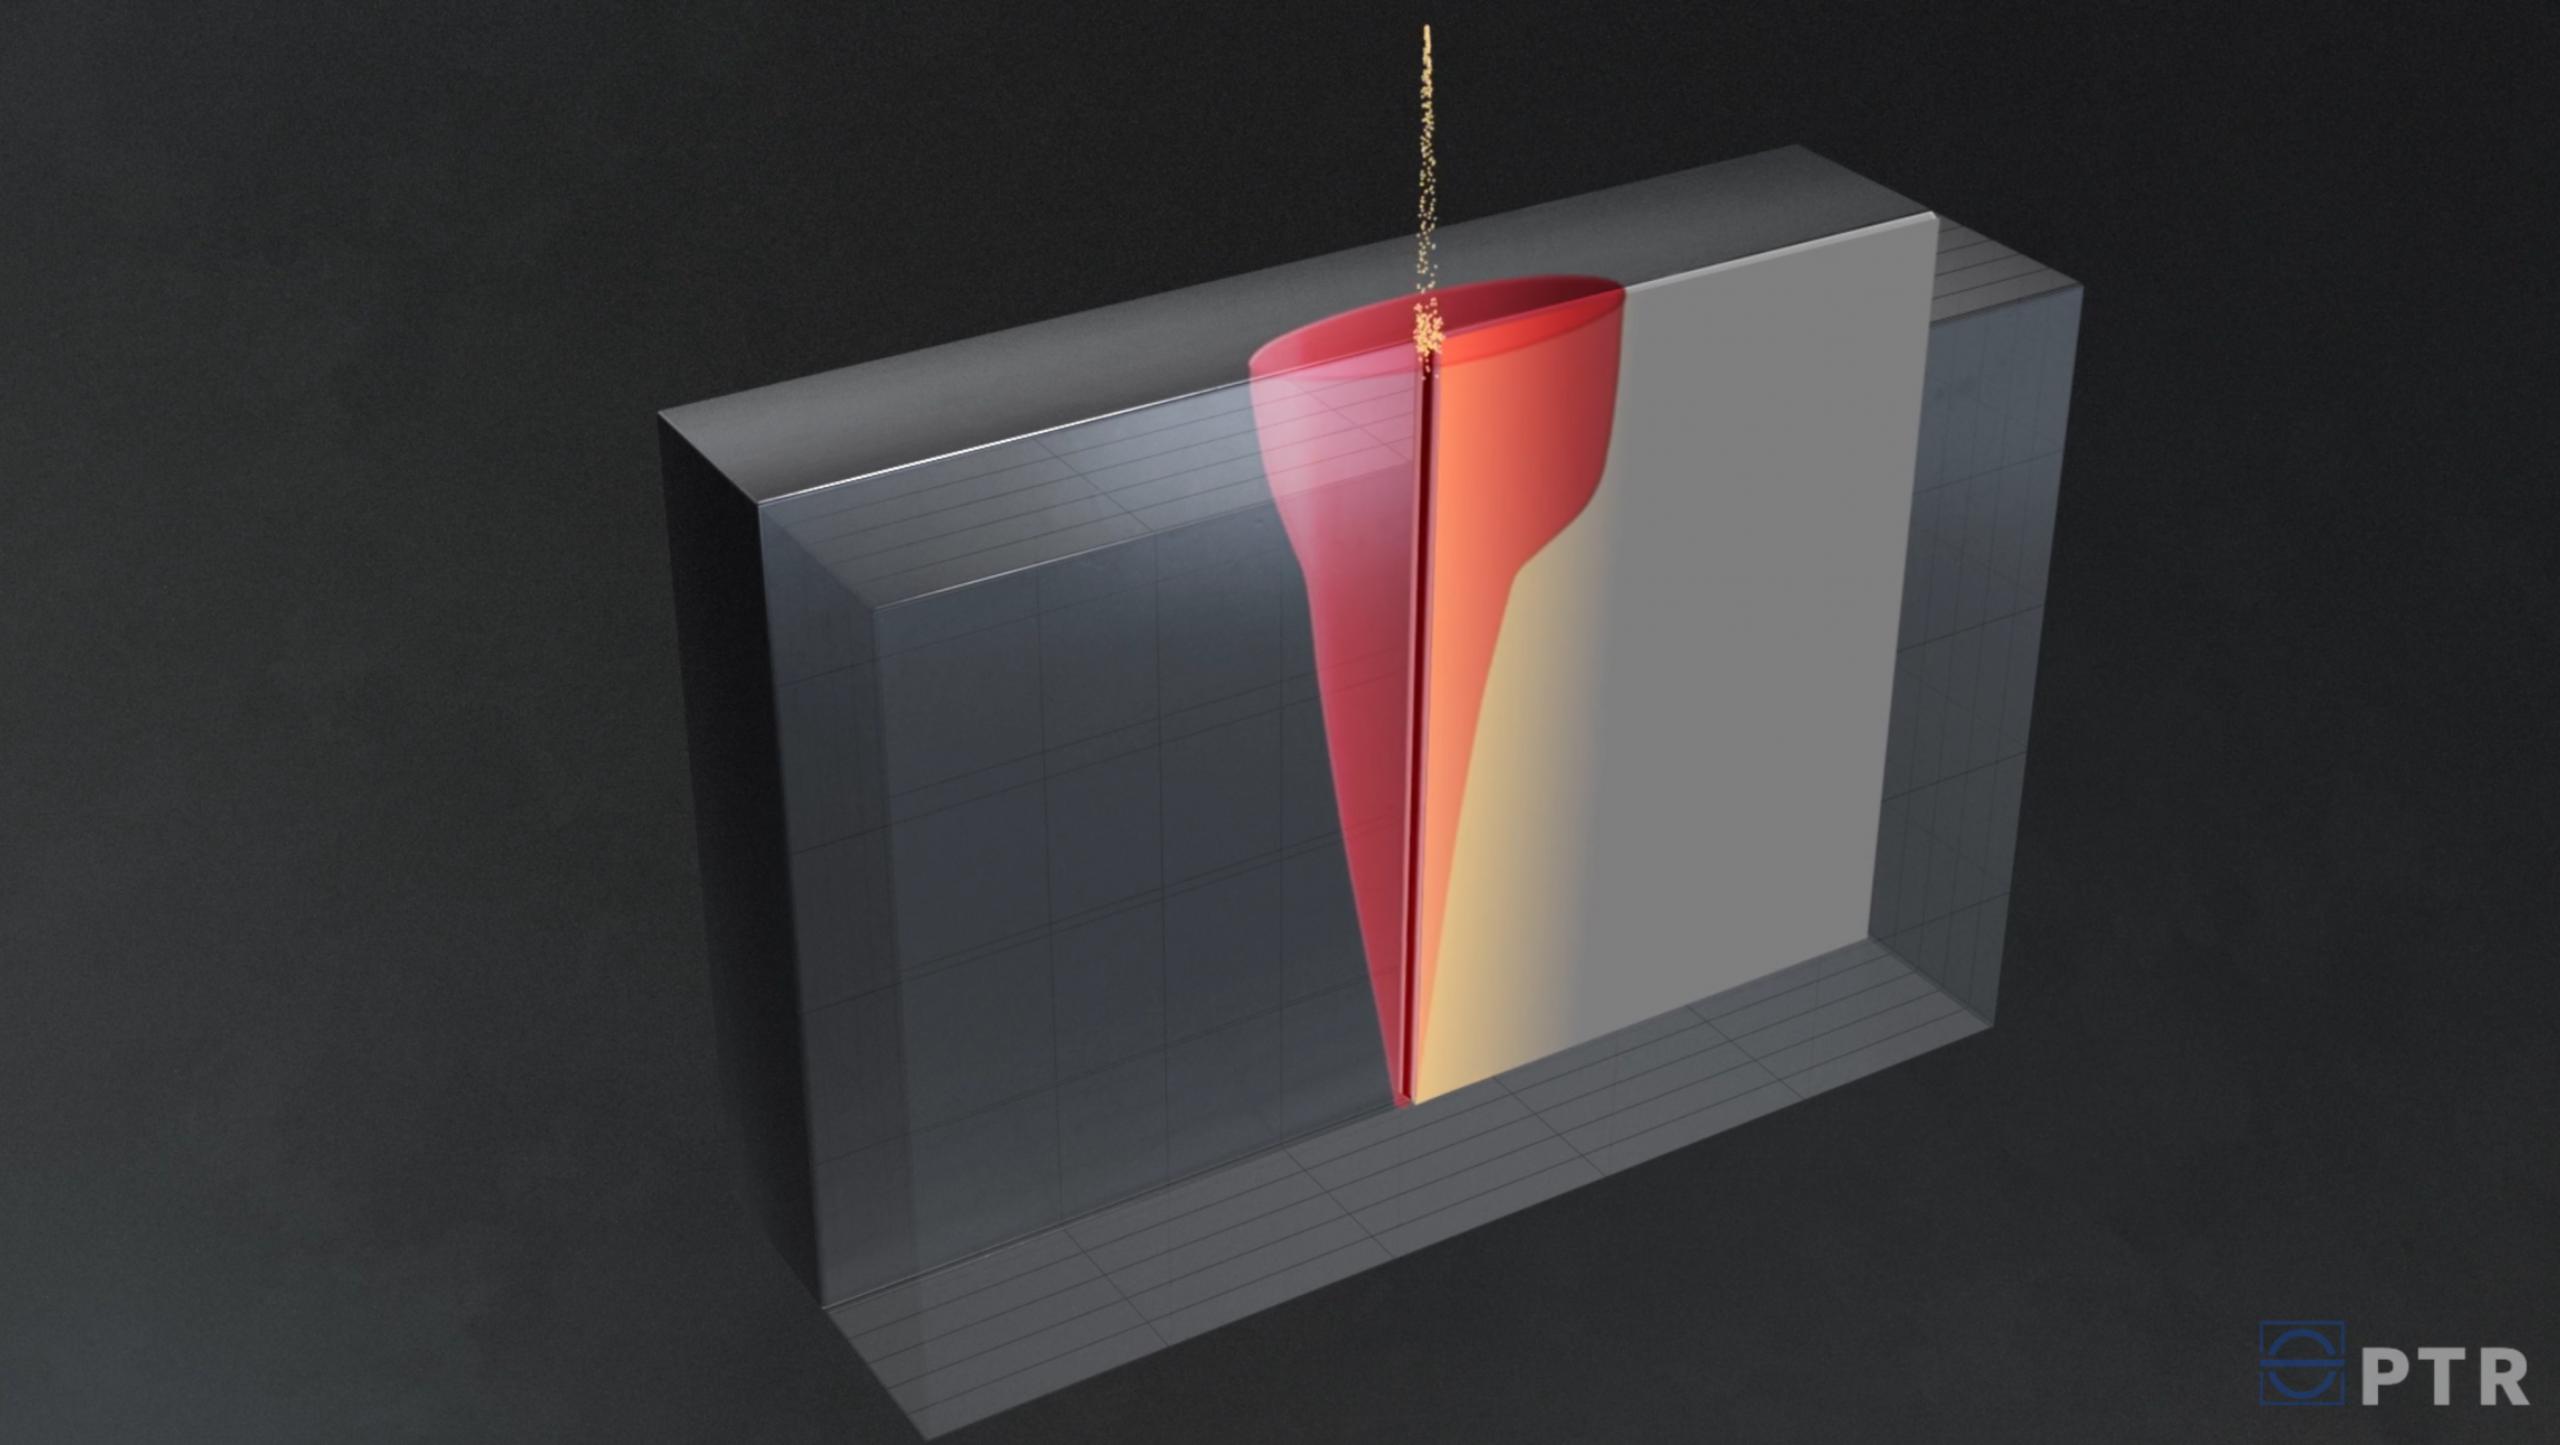 PTR Precision Technologies – Electron Beam Welding